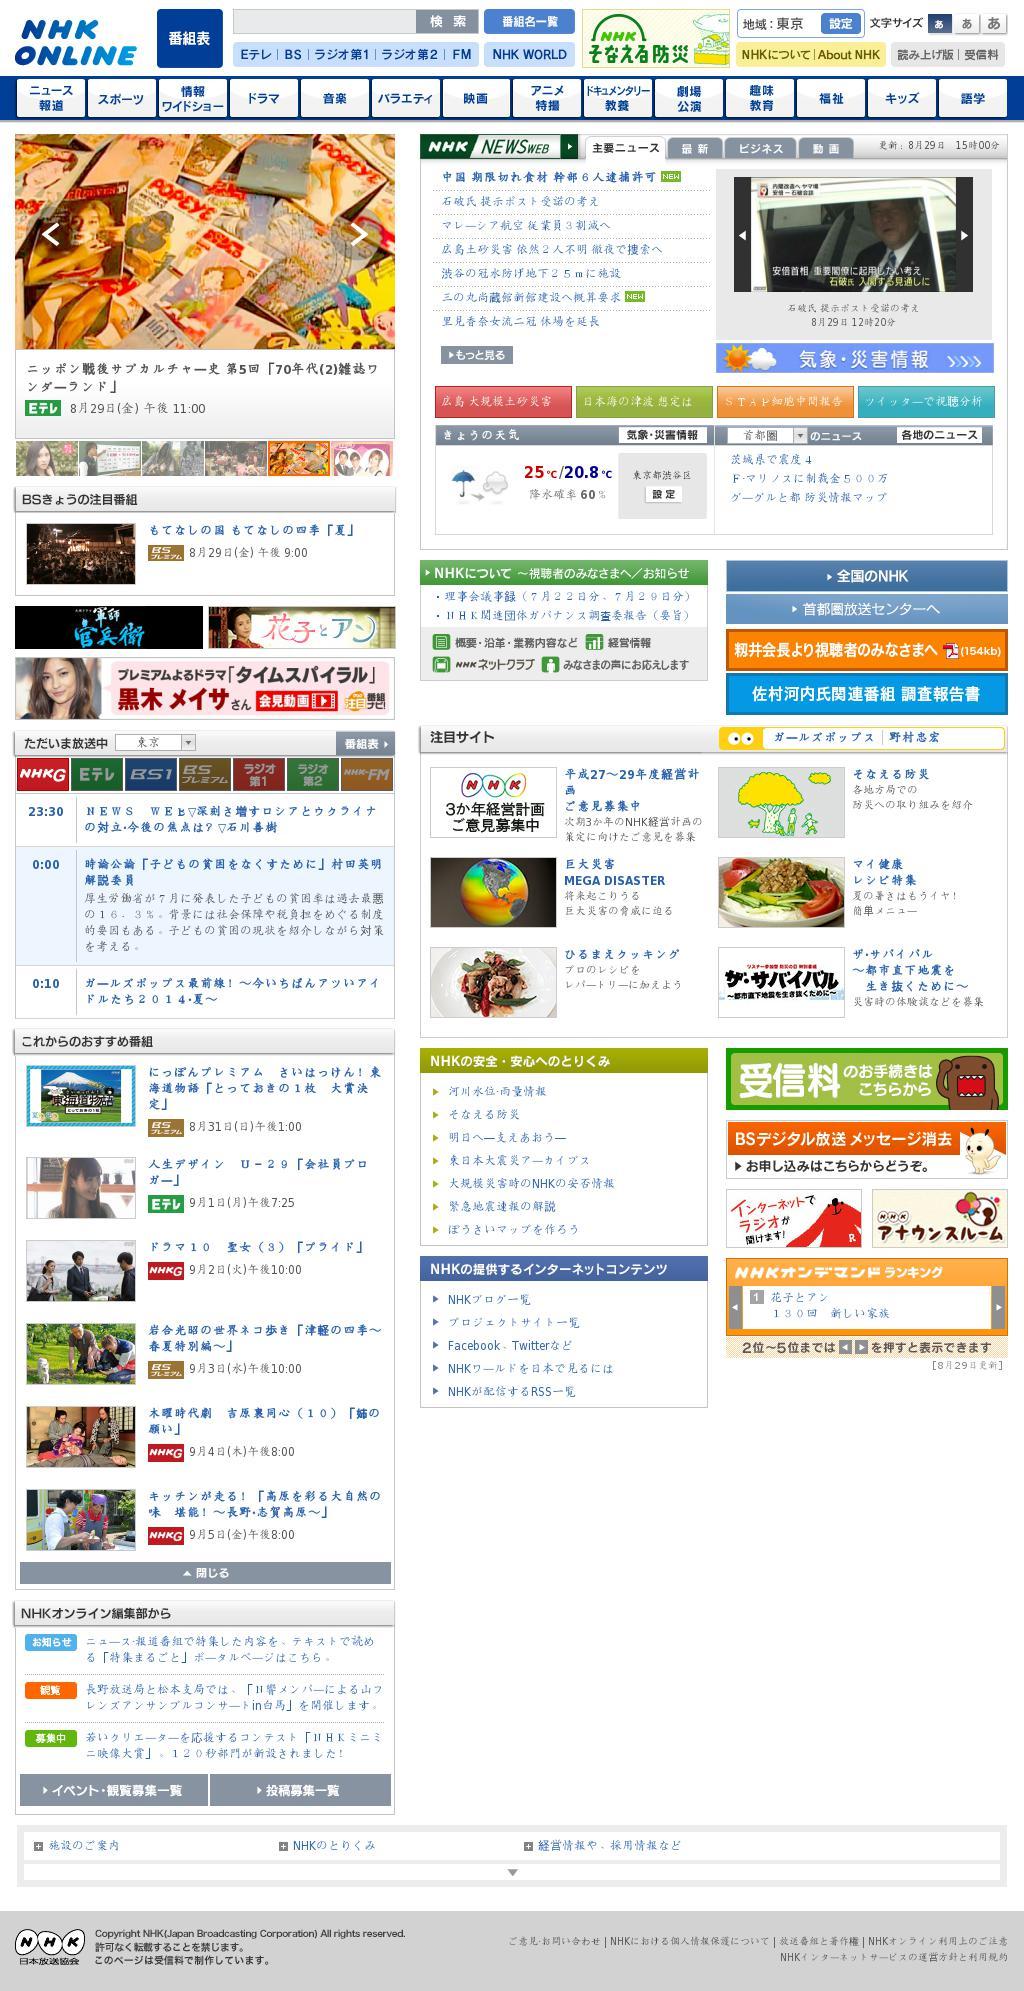 NHK Online at Friday Aug. 29, 2014, 3:11 p.m. UTC